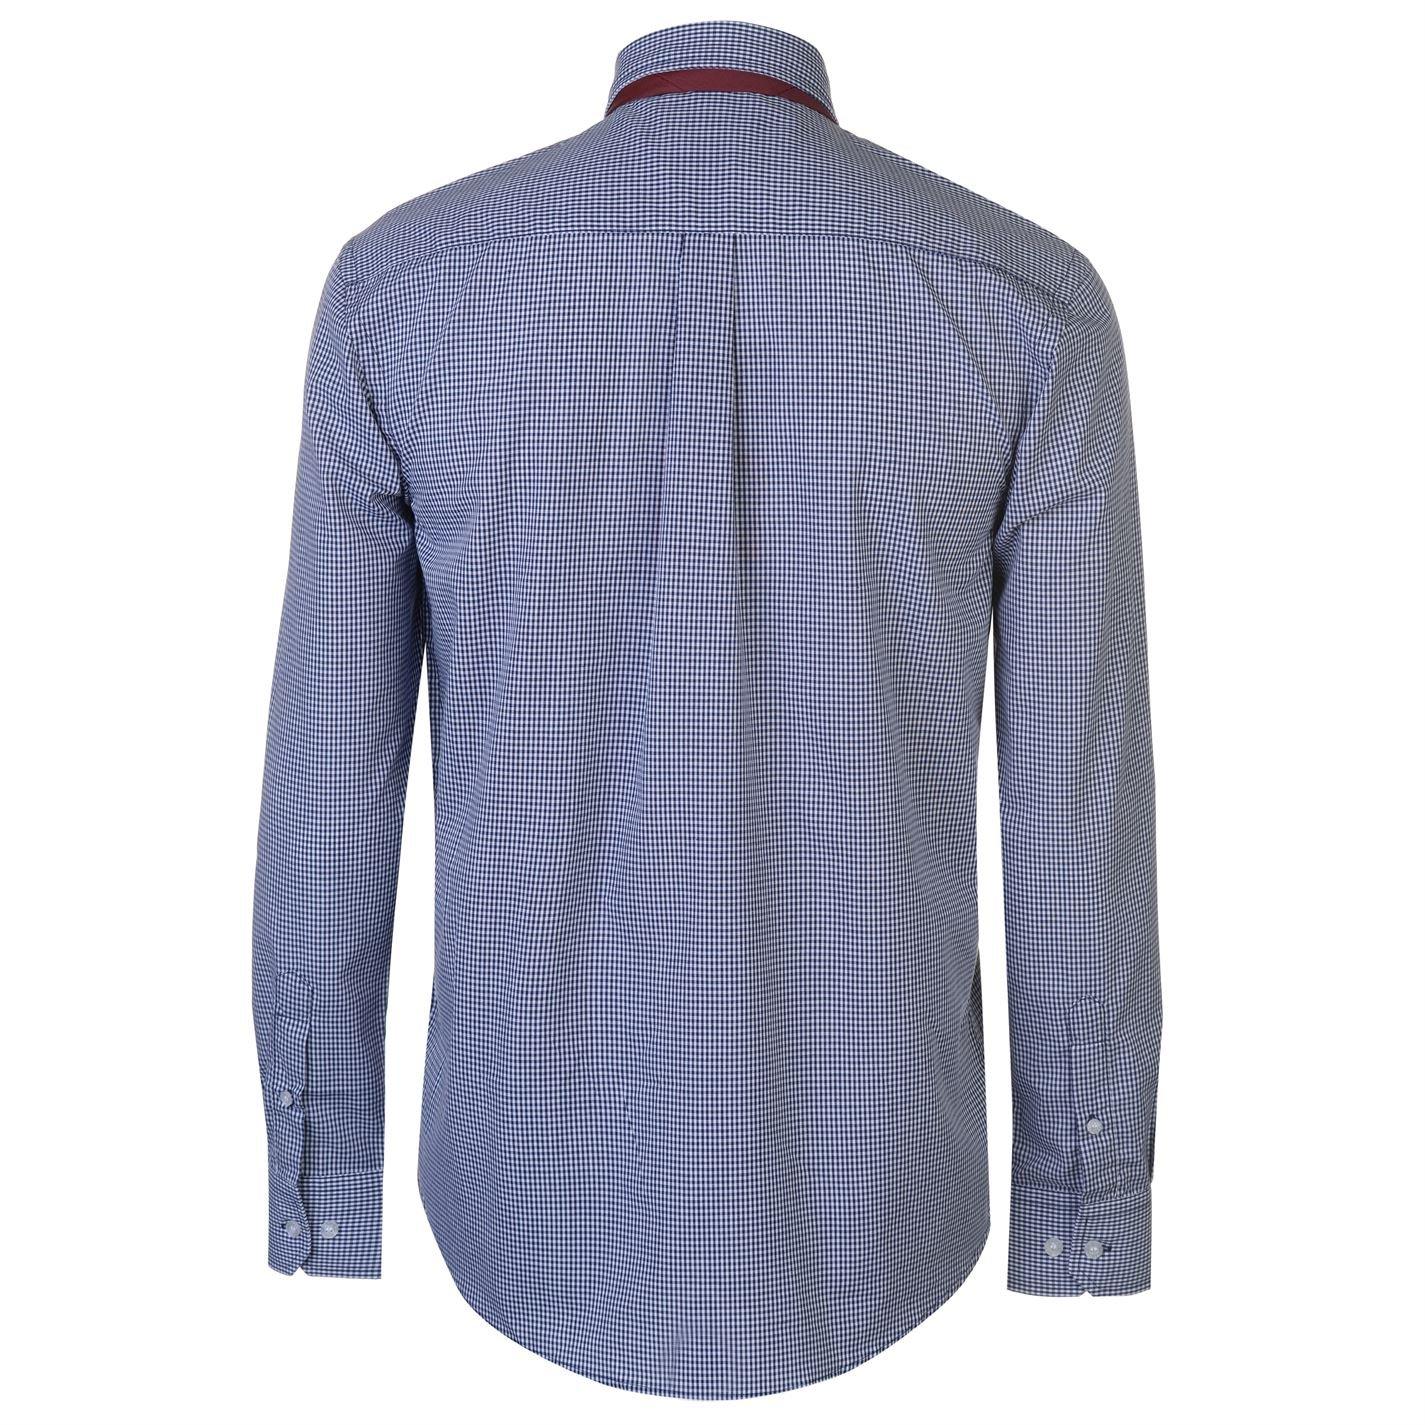 Pierre Cardin Mens Shirt Tie Set Long Sleeve Casual Regular Fit